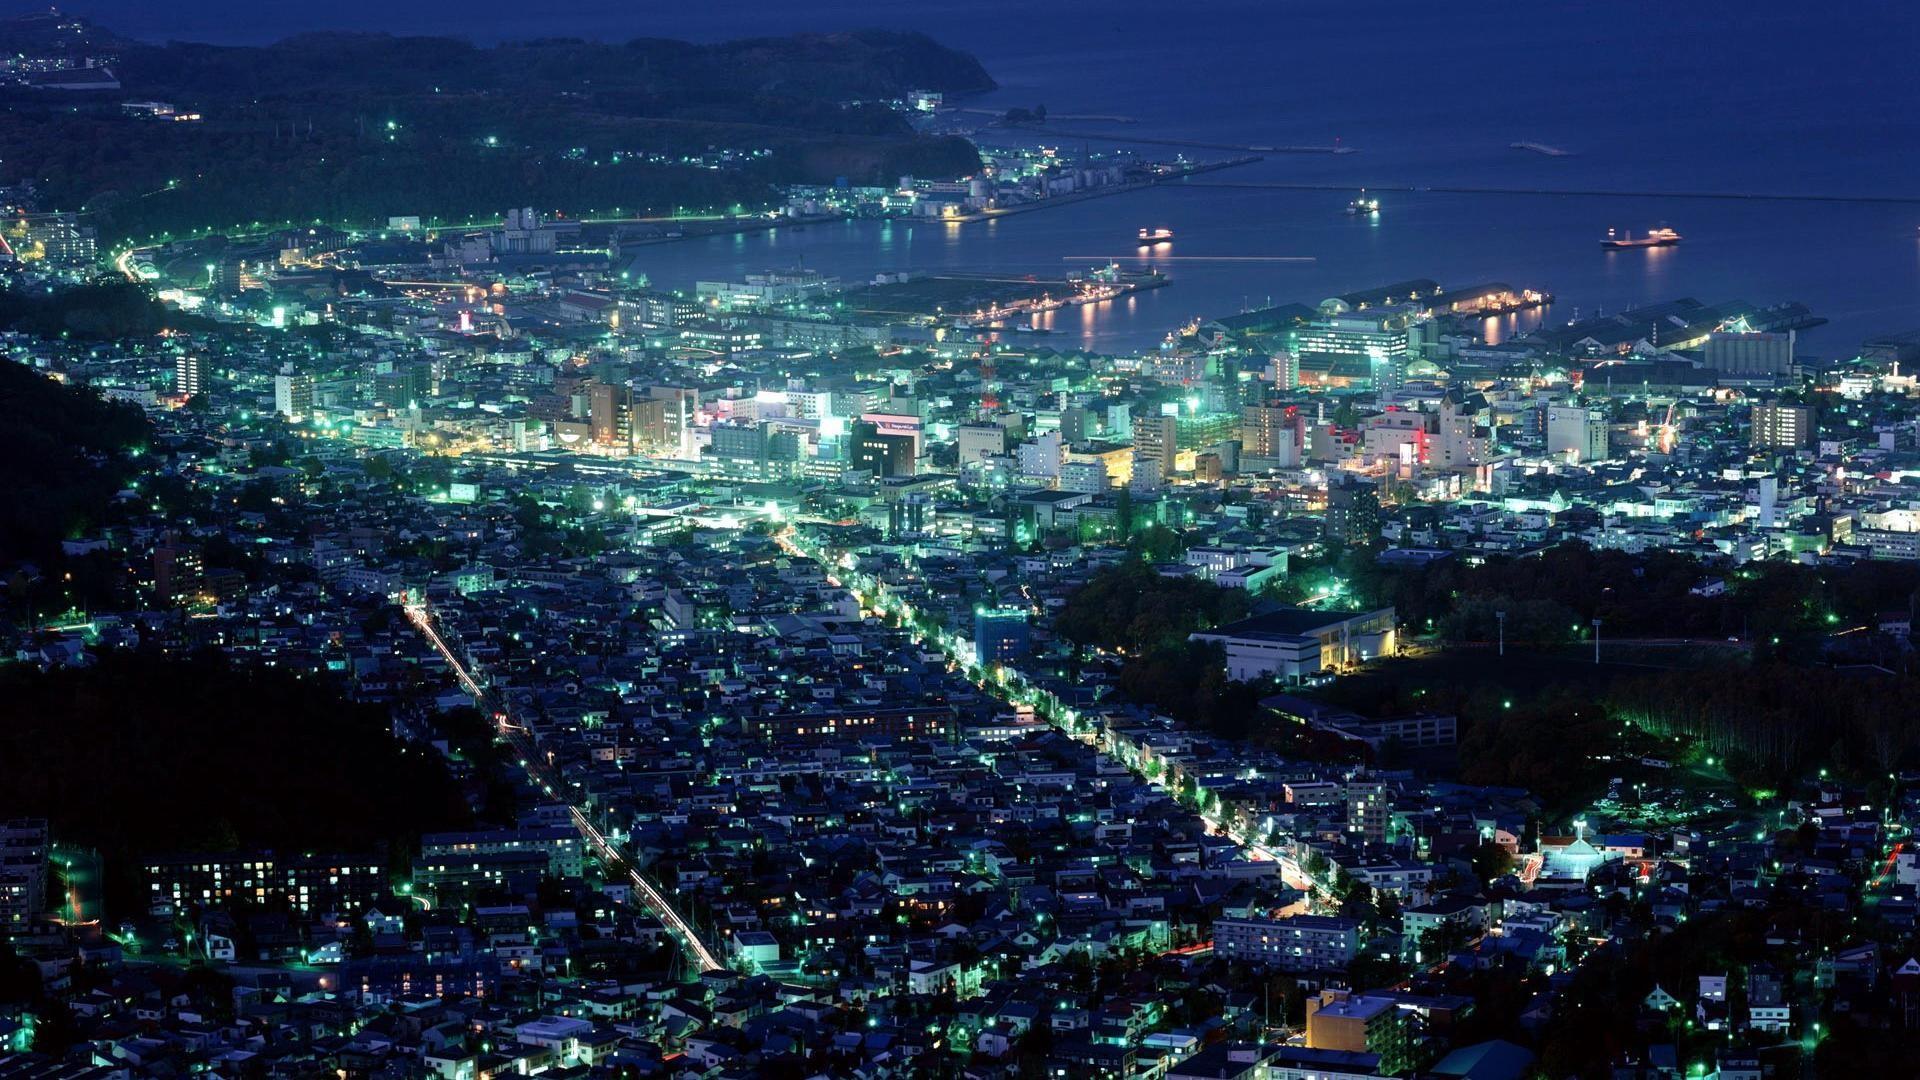 Night City Wallpaper Hd